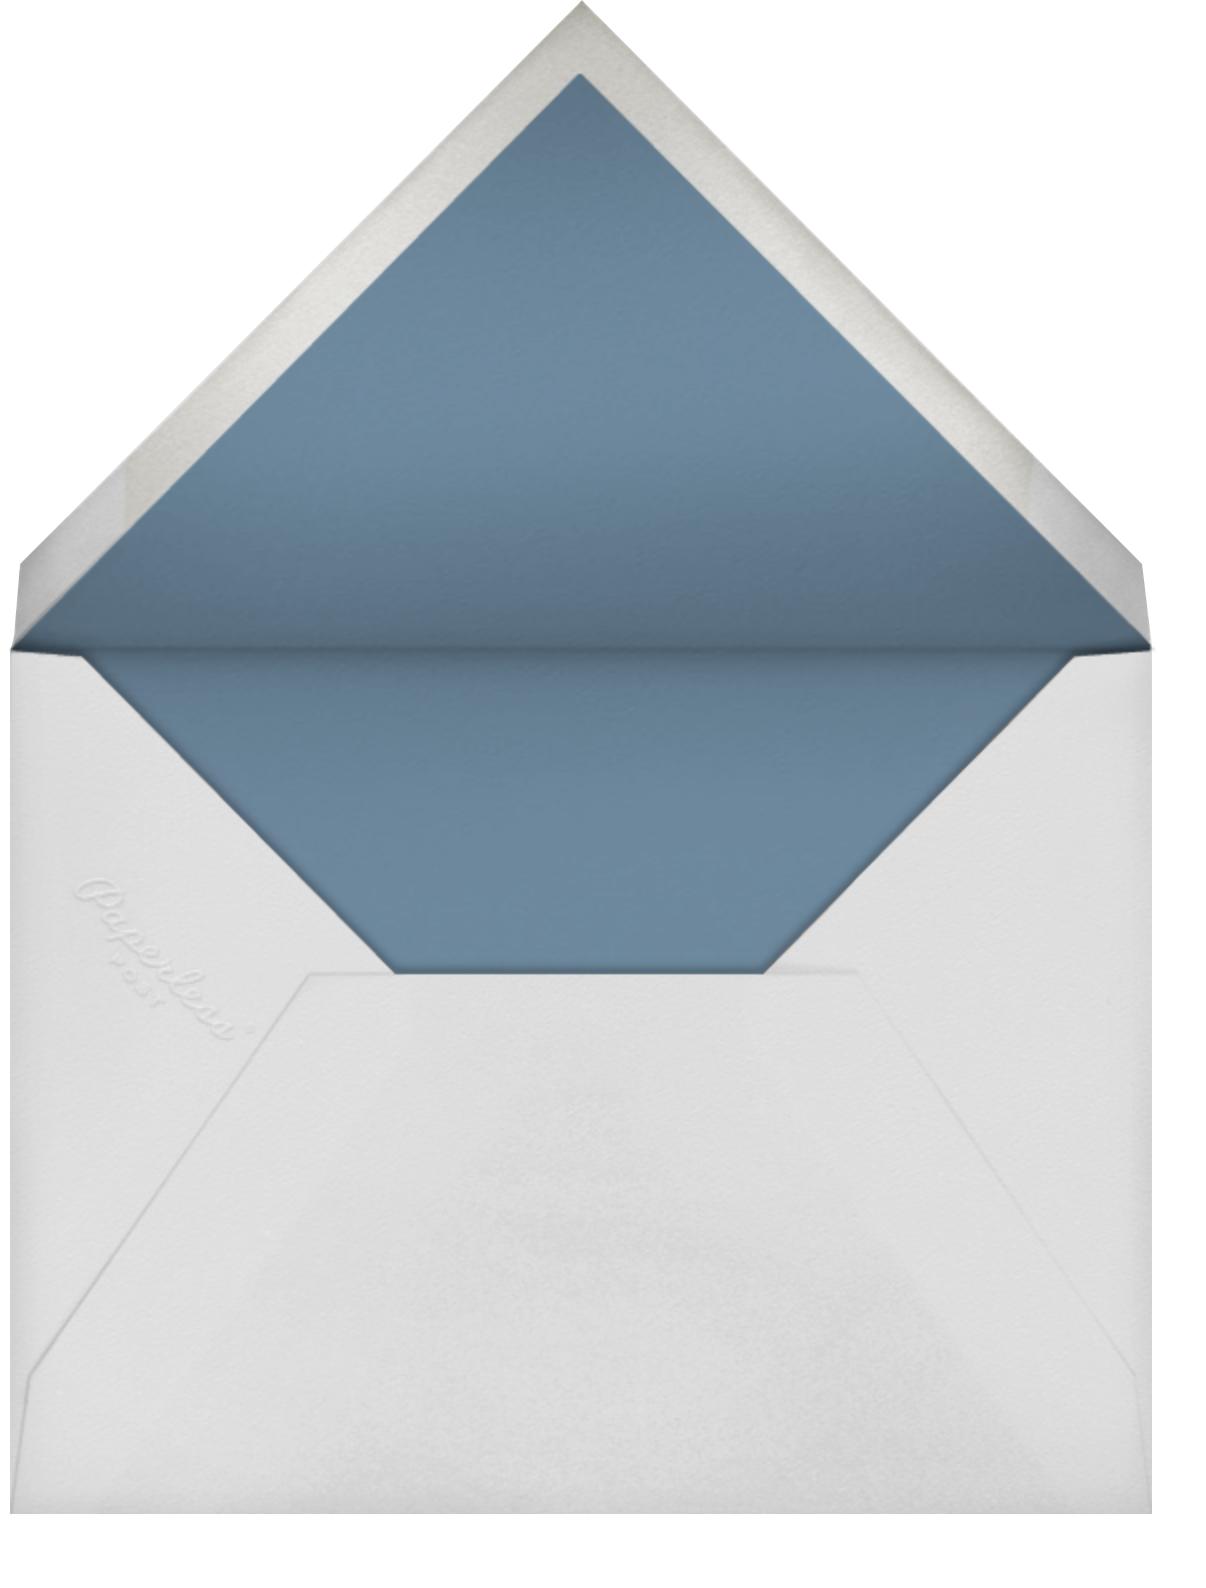 Marbled - Oscar de la Renta - Reception - envelope back